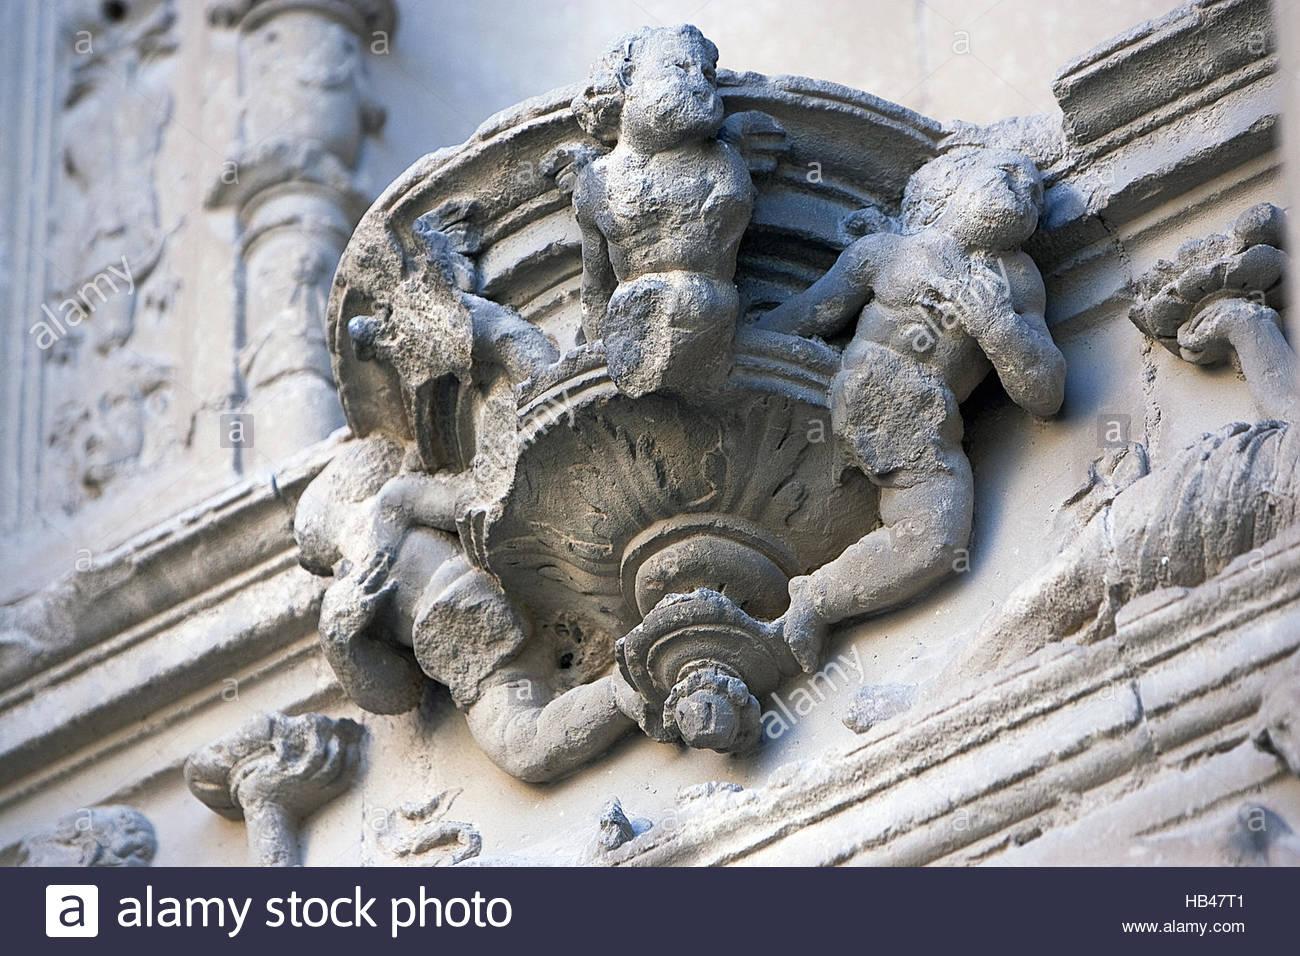 Cantilever, Ubeda, Jaen province, Spain - Stock Image